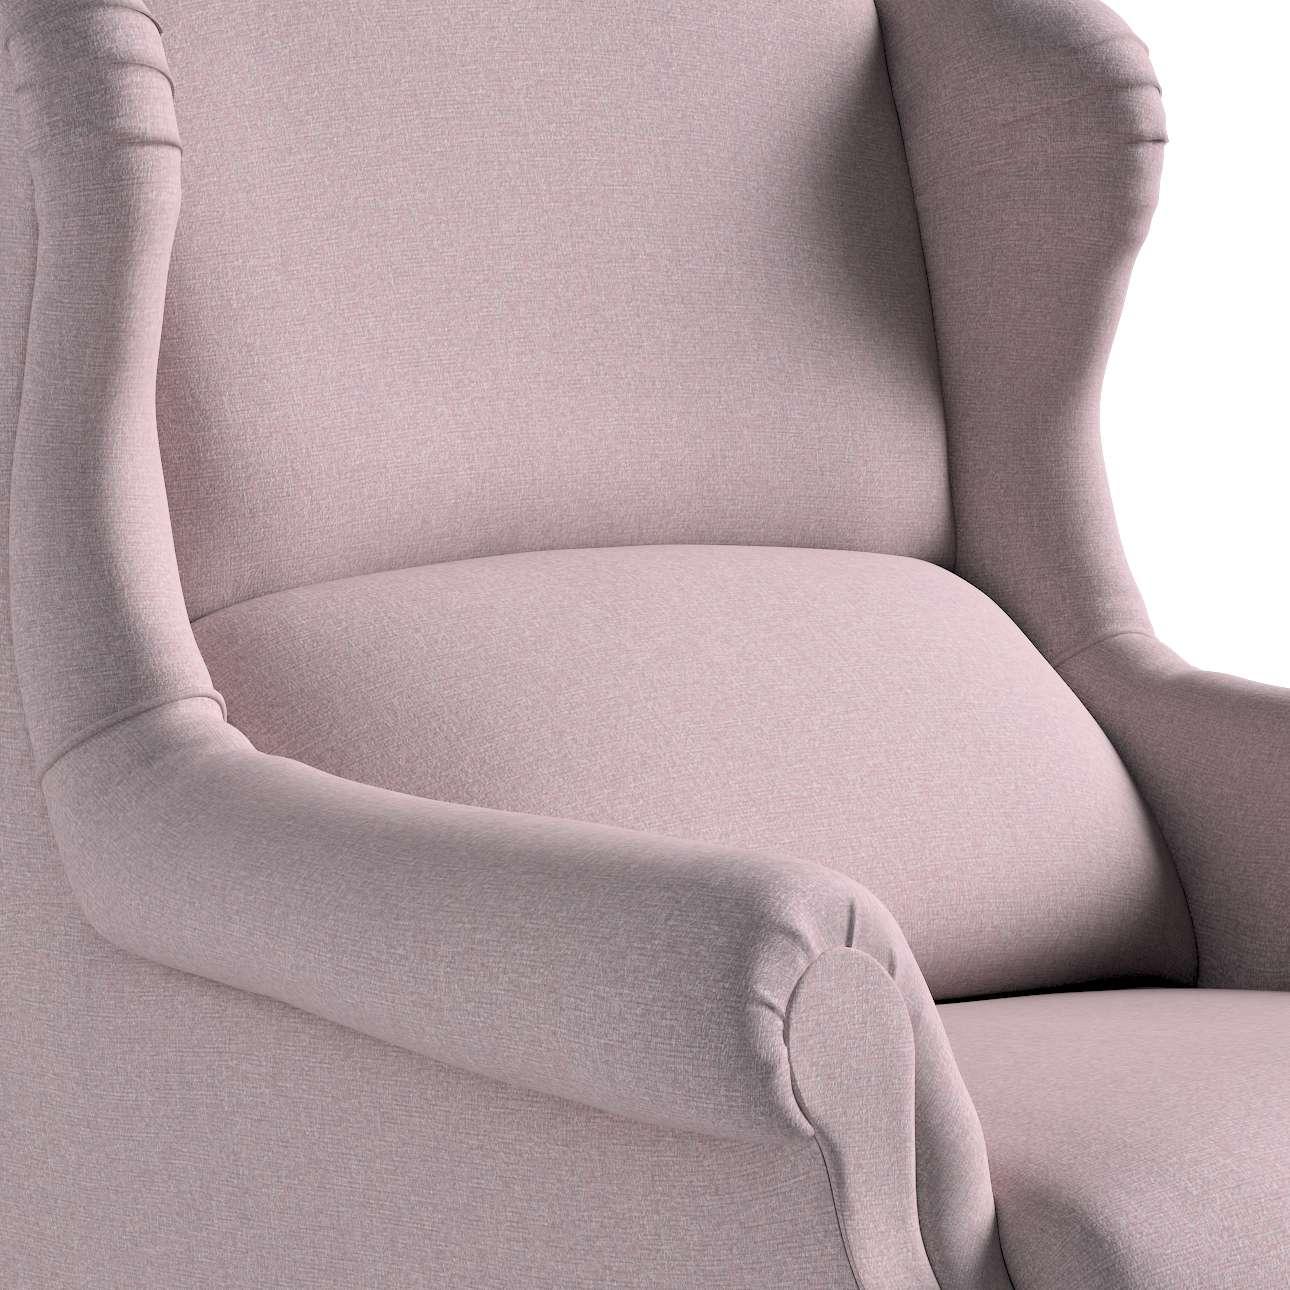 Fotel Unique w kolekcji Amsterdam, tkanina: 704-51